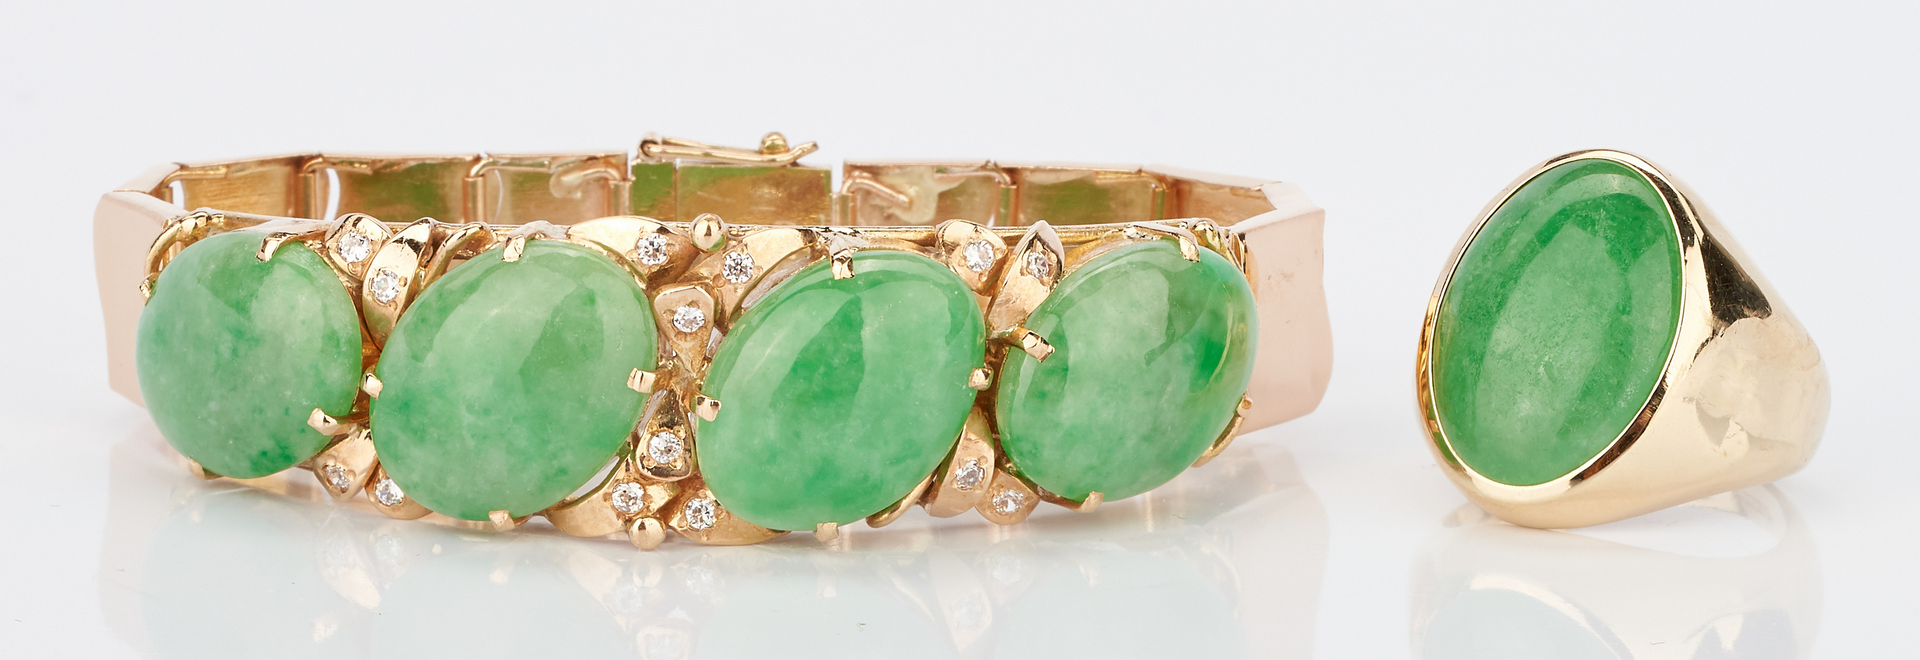 Lot 21: 14K Jade Bracelet and 14K Jade Ring